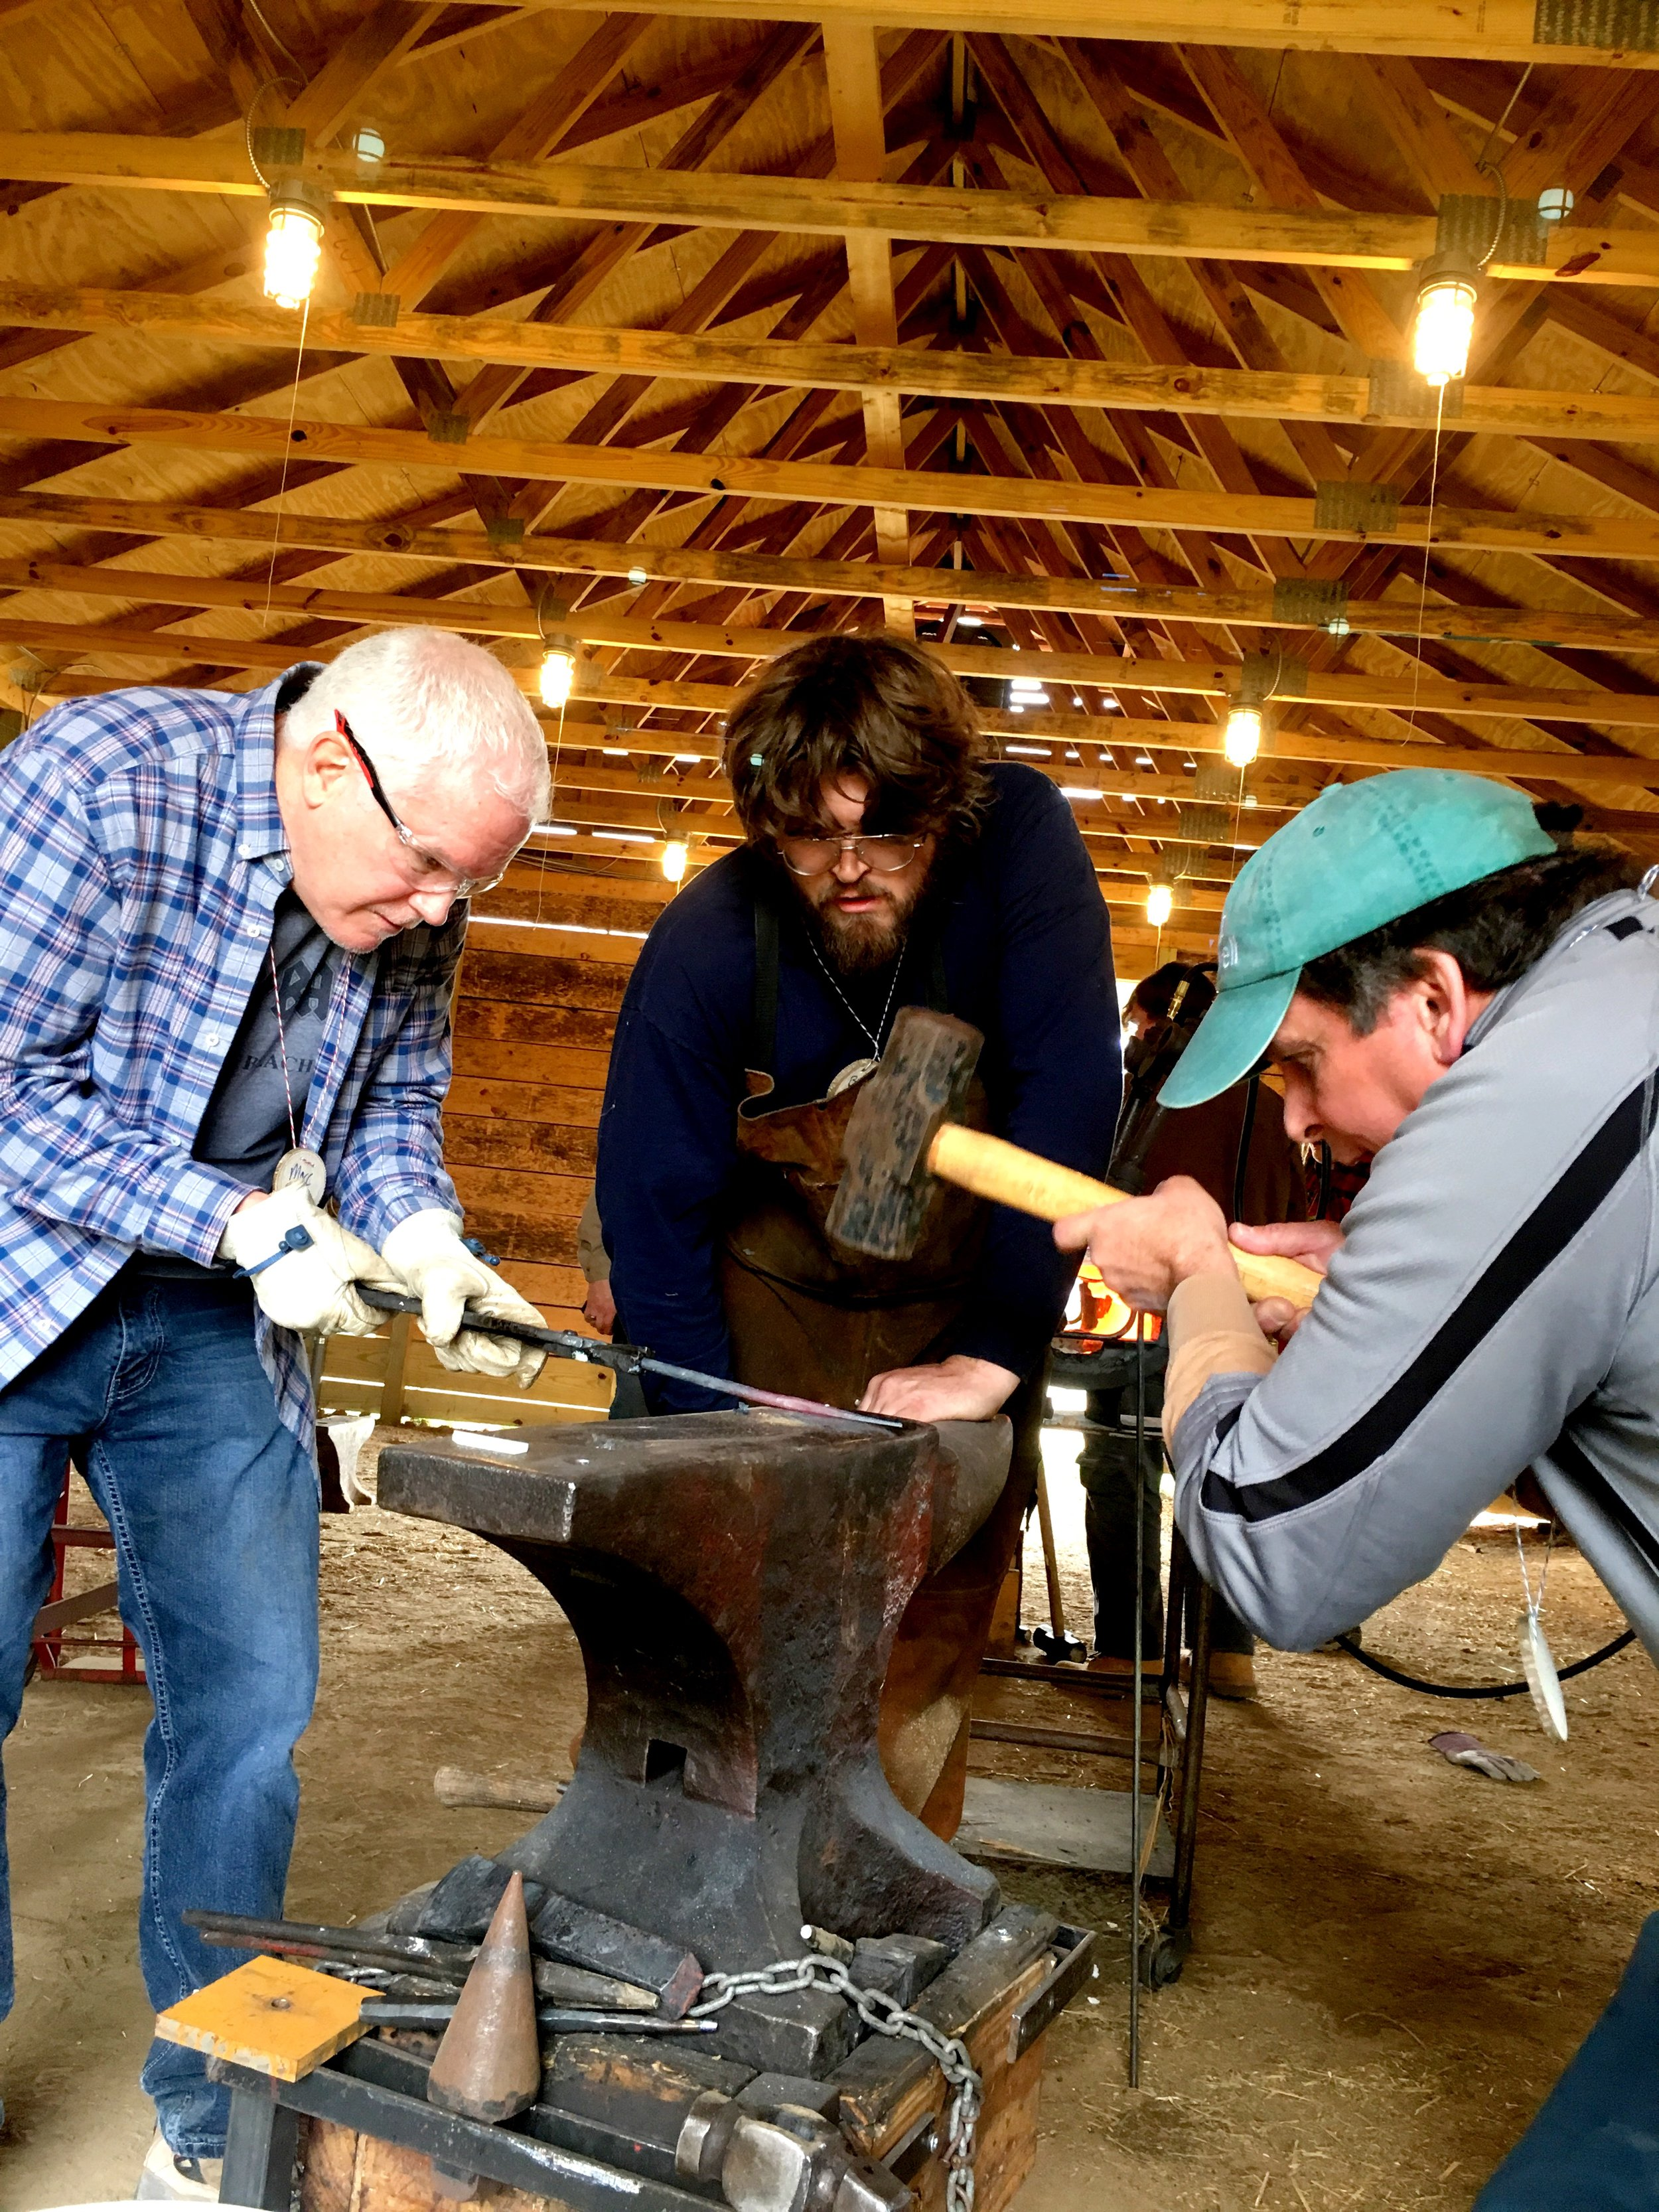 blacksmithing_from_scratch.JPG